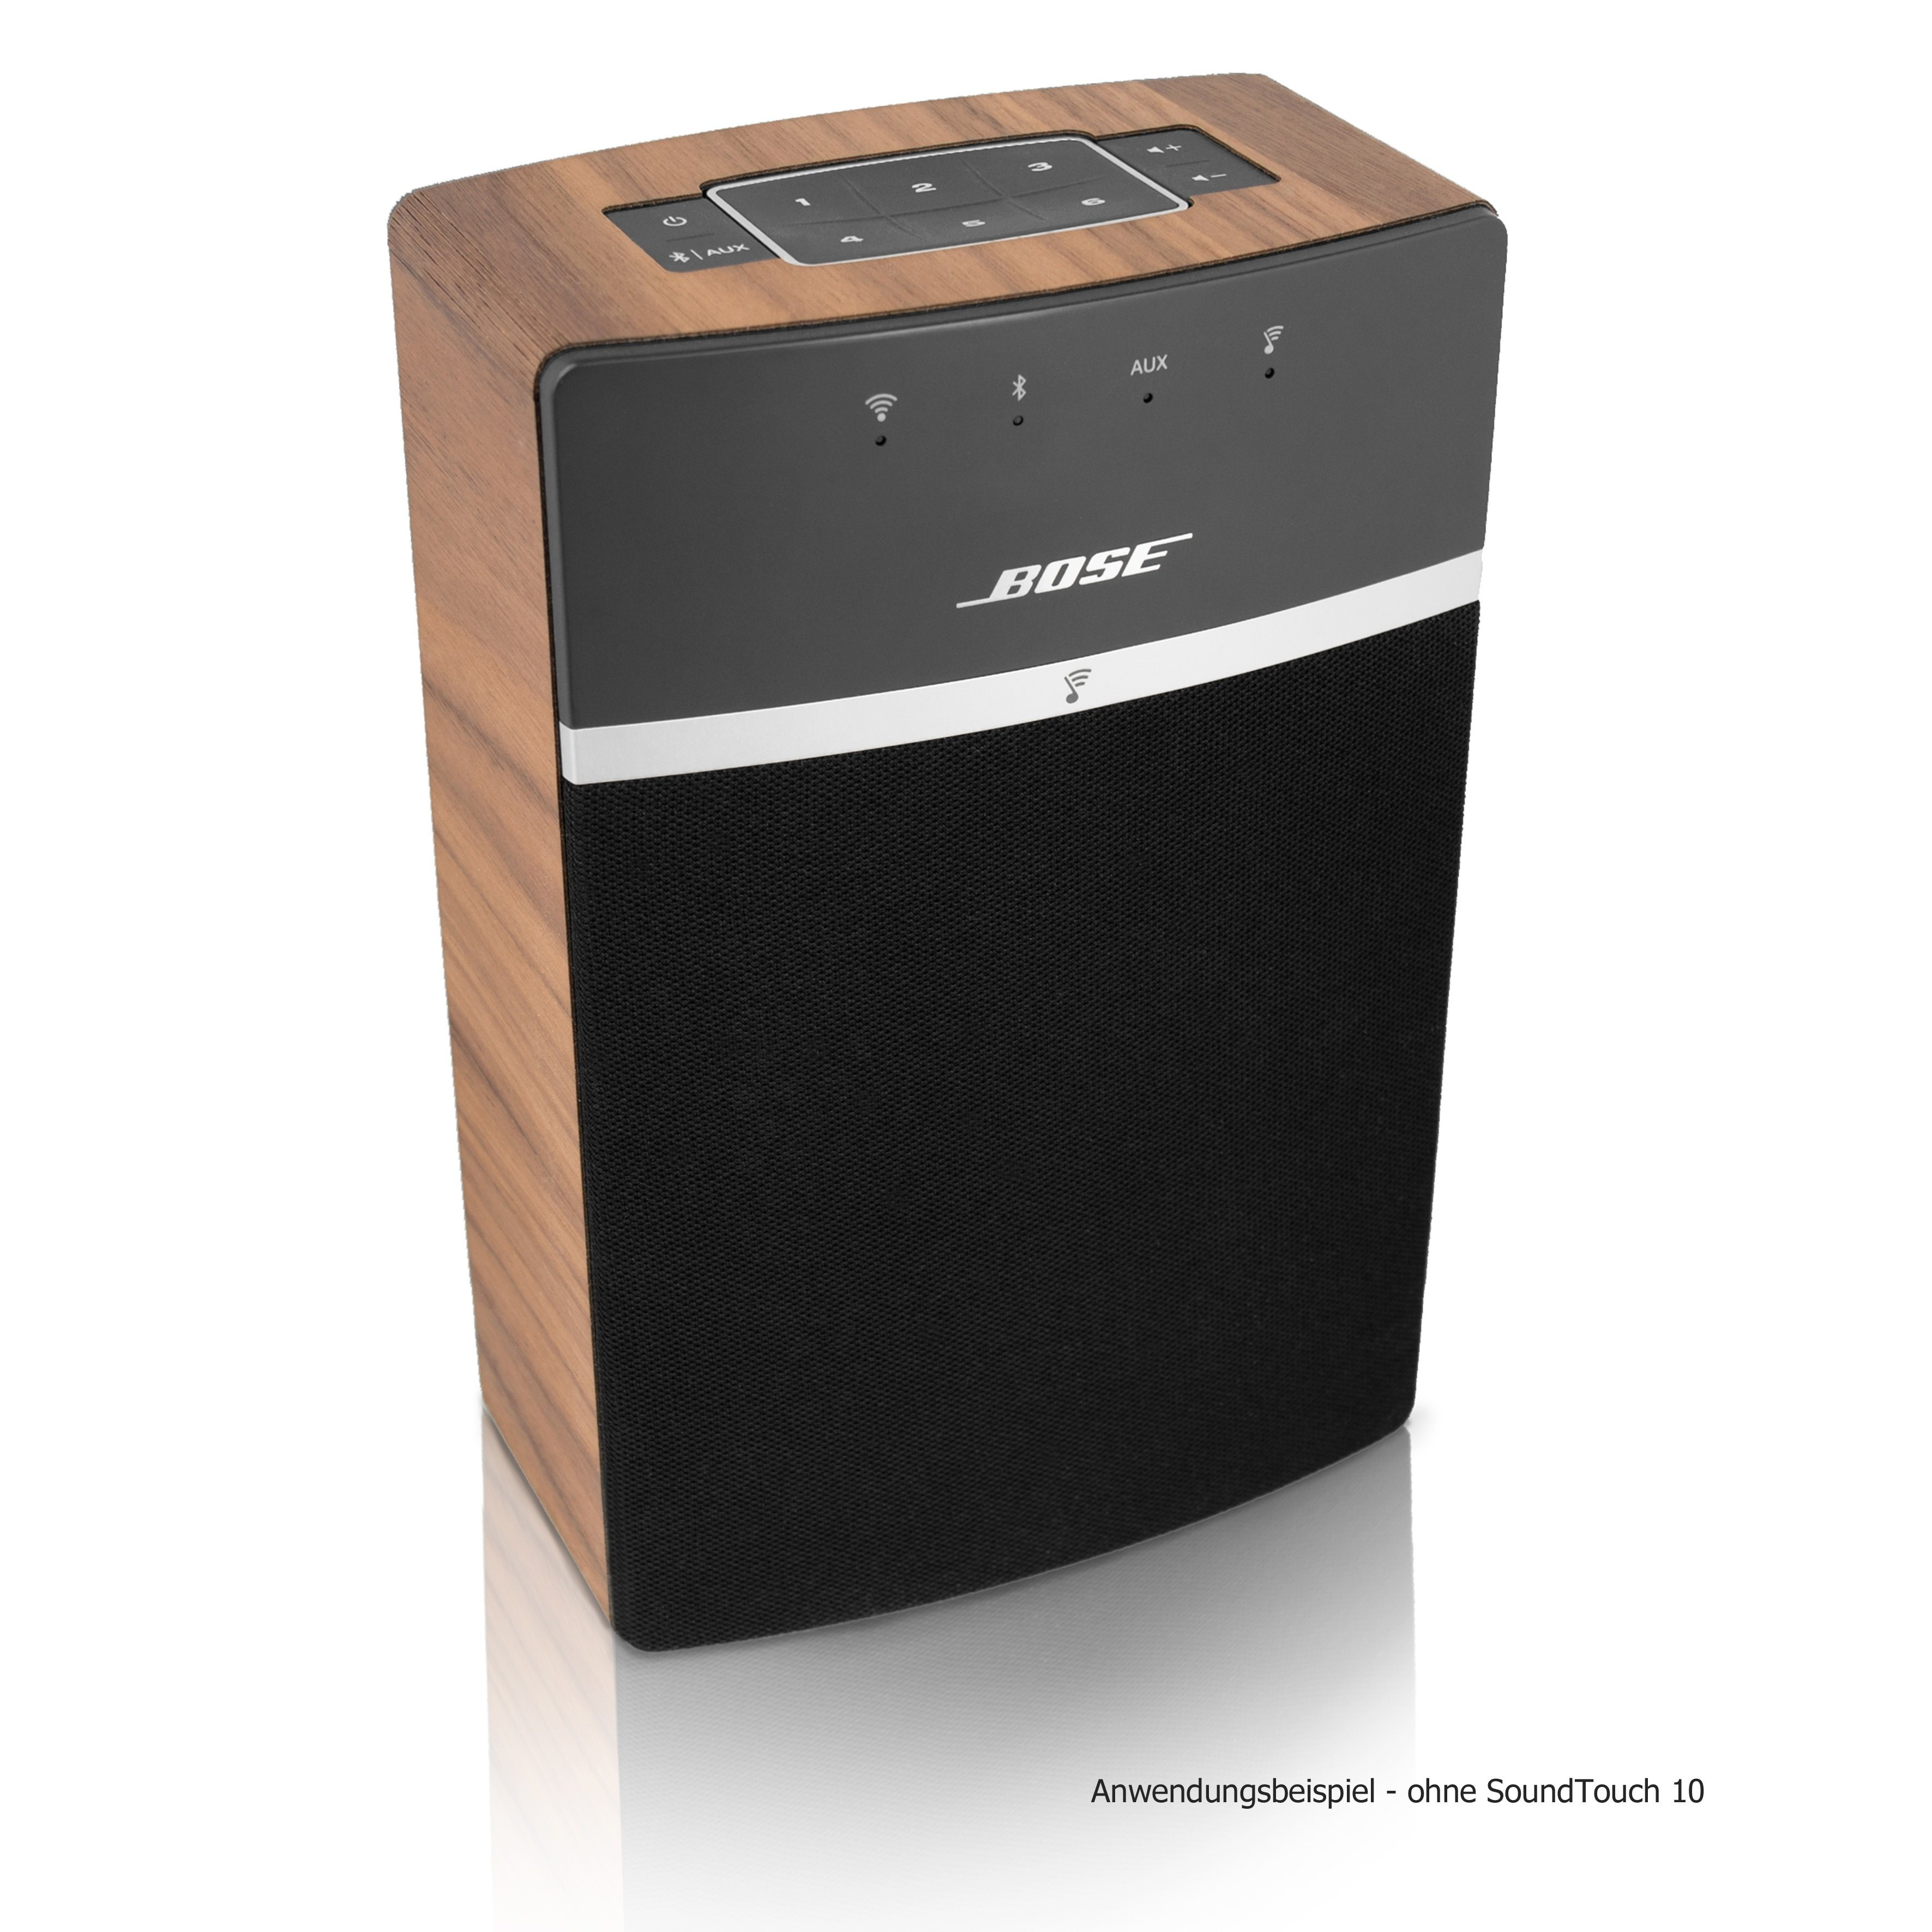 Cover Für Das Bose Sound Touch 10 »Walnuss Echtholz Cover«